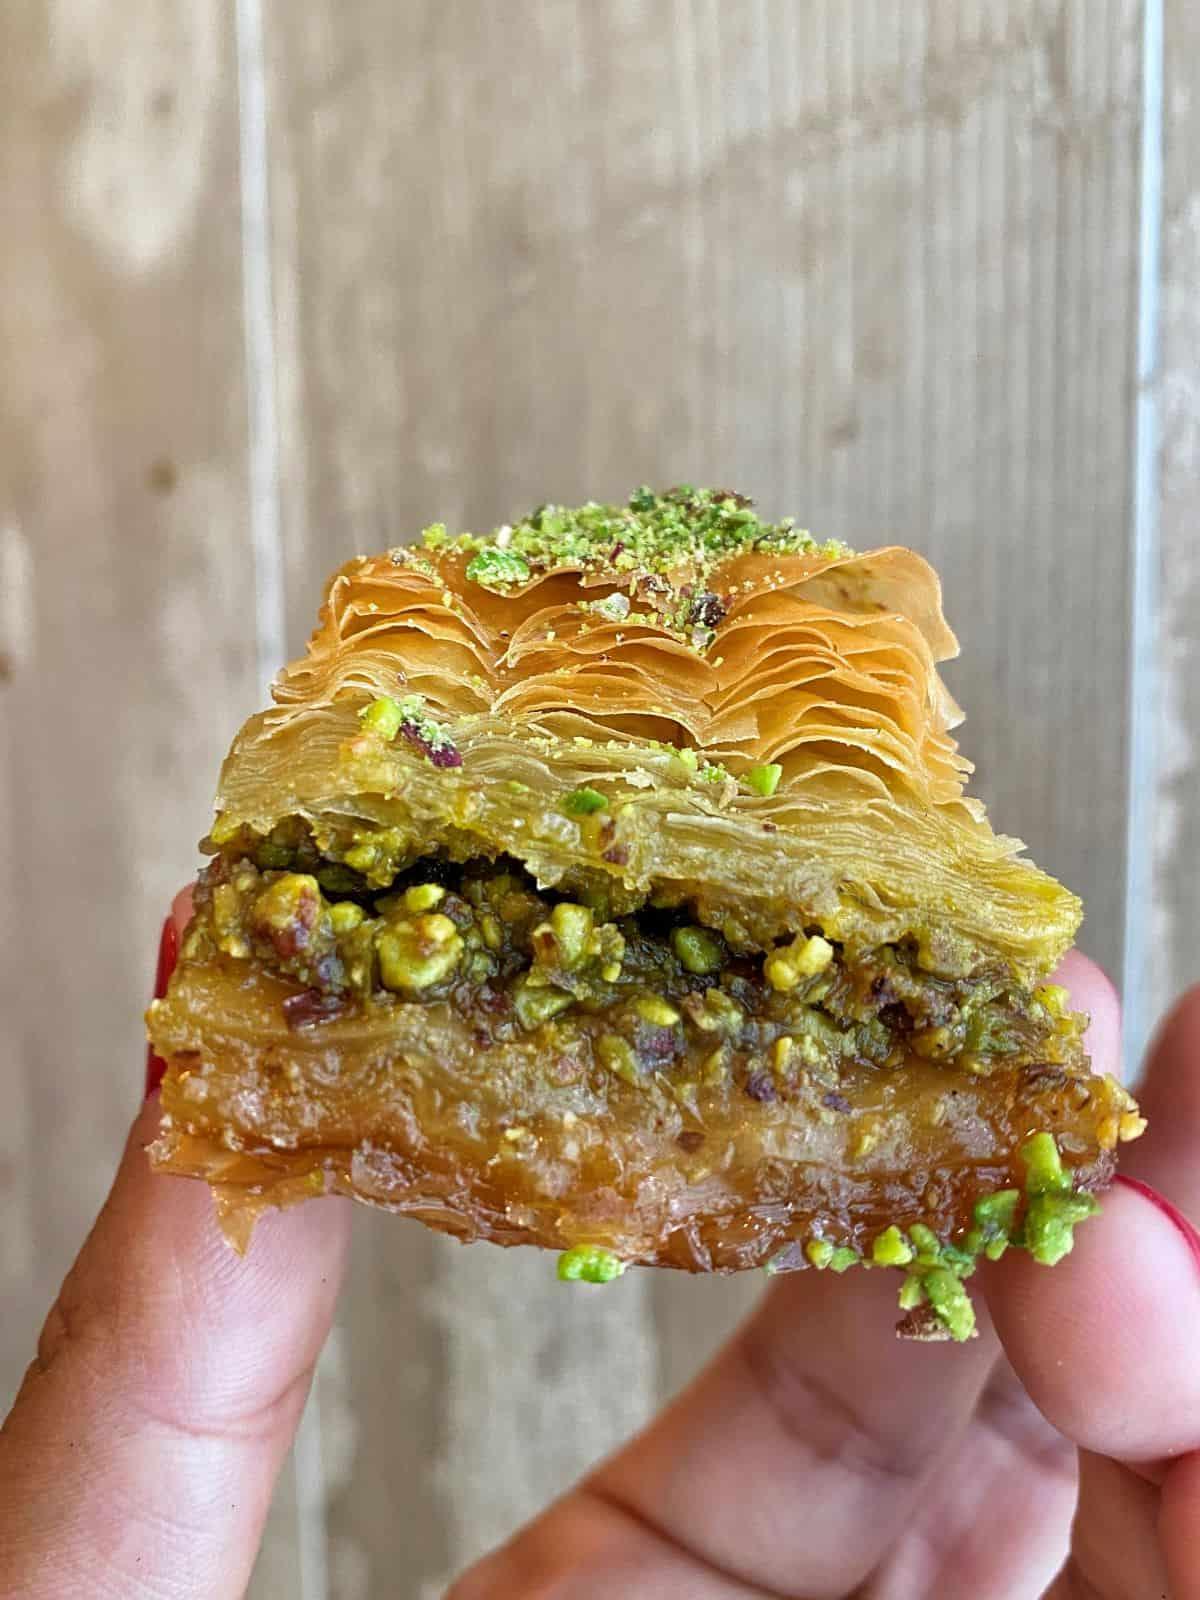 anatolia-village-restaurant-turque-paris-10eme-pide-baklava